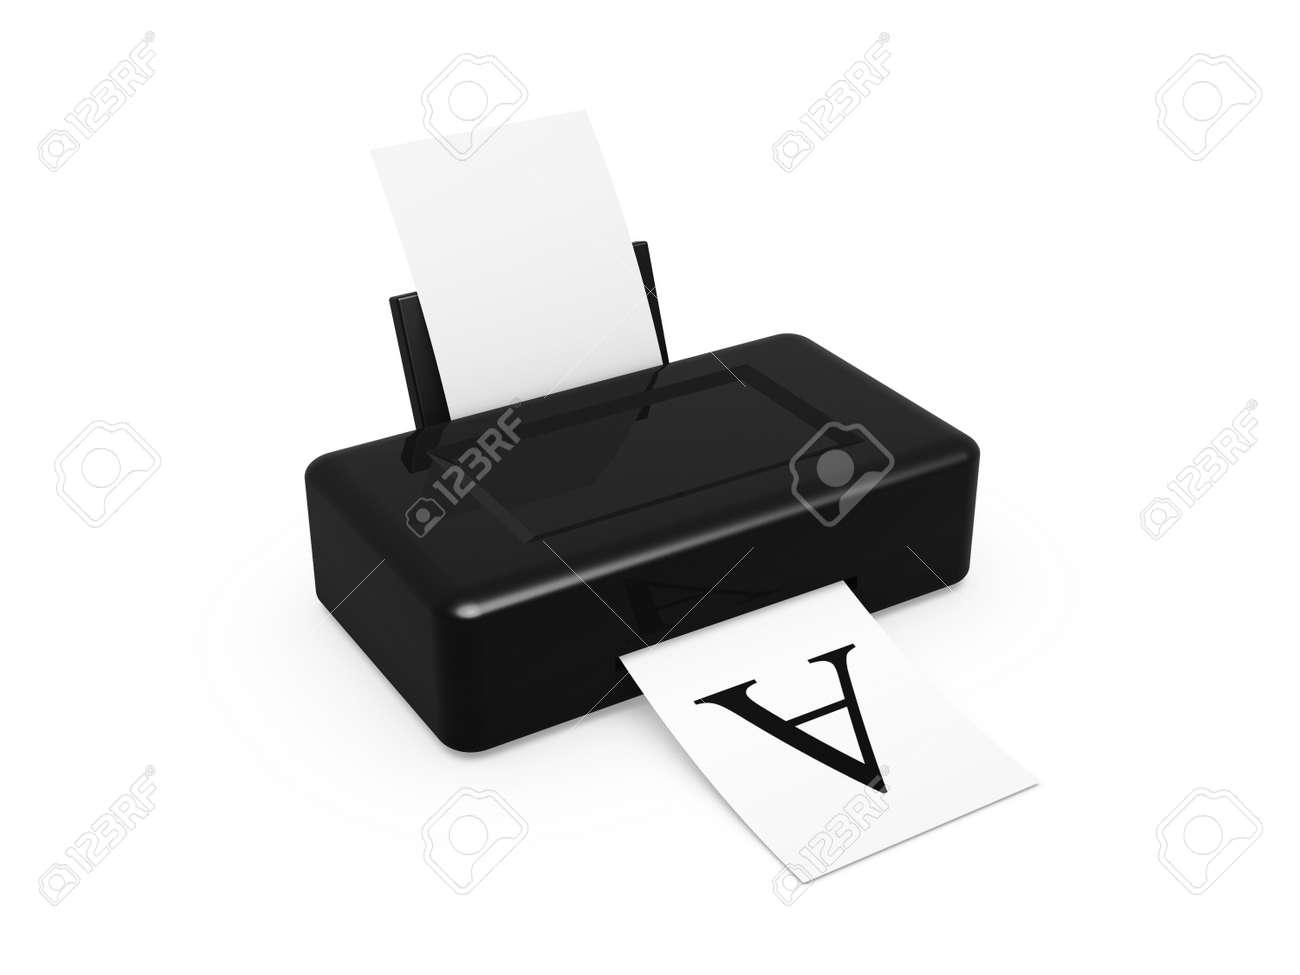 black printer print test font on white background Stock Photo - 11739974